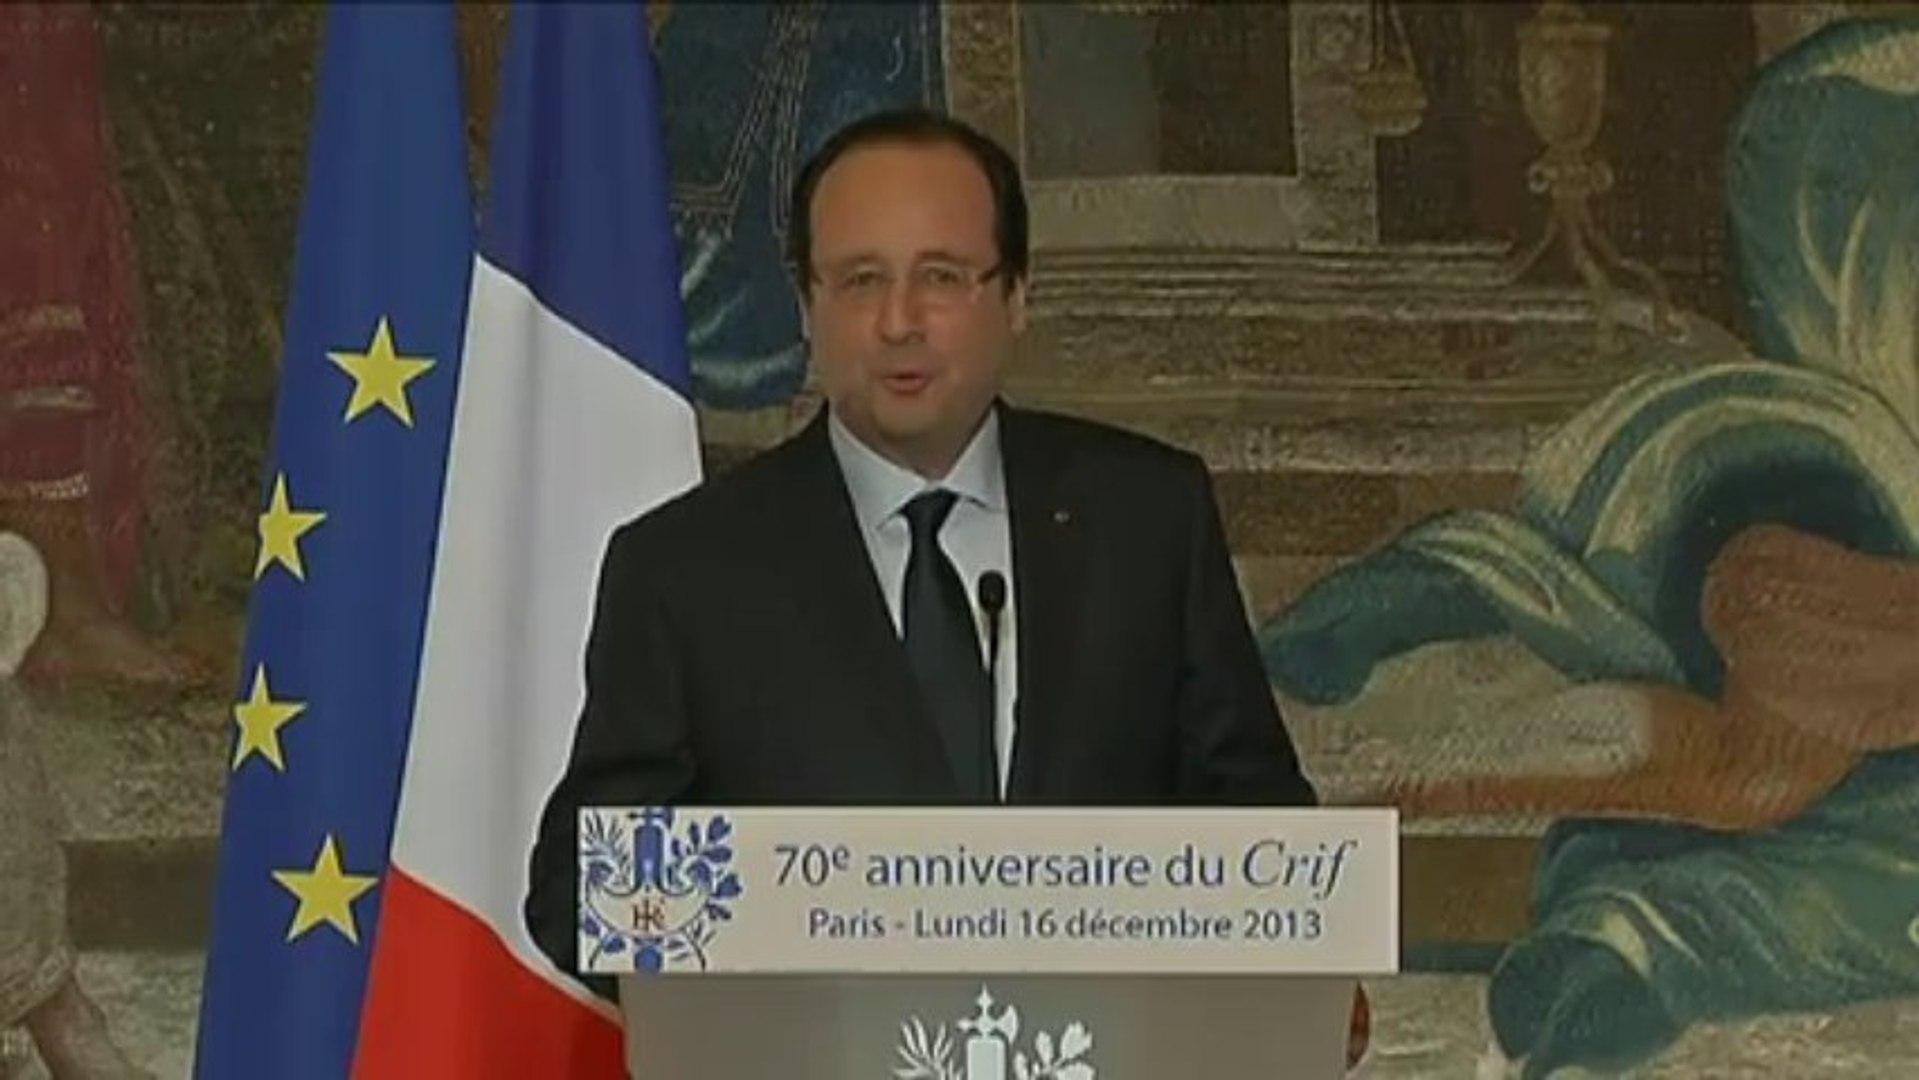 Gaffe de Hollande sur la visite de Valls en Algérie :